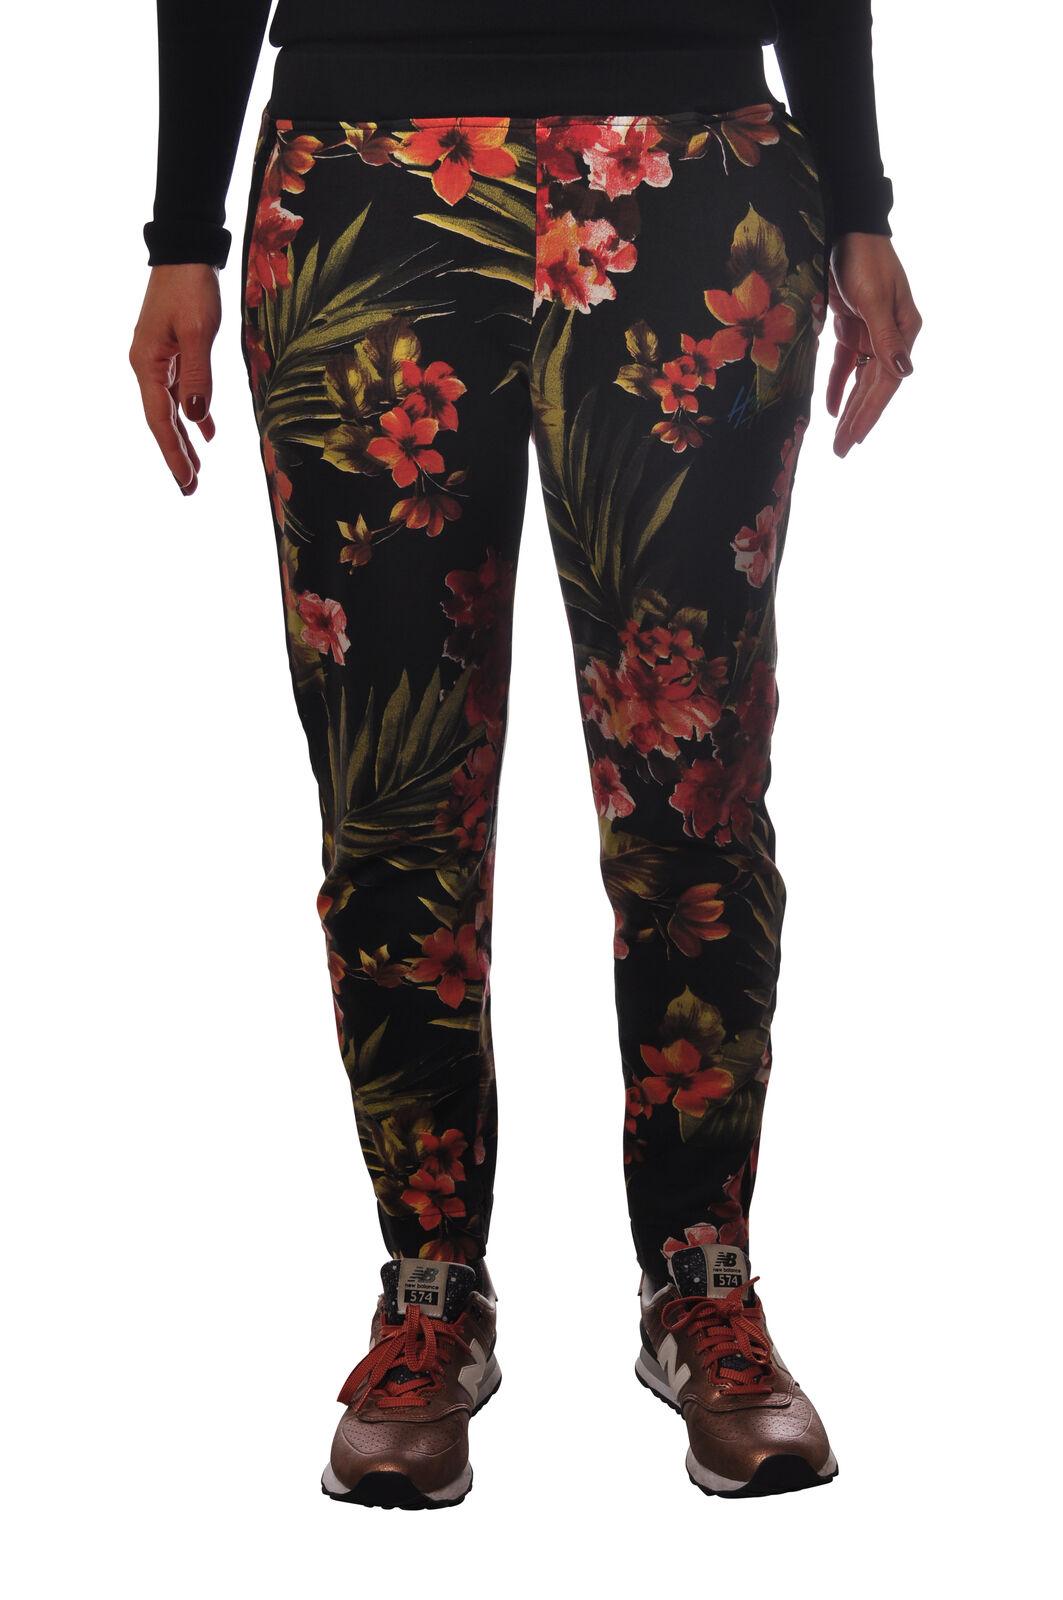 Happiness-pants, trousers, sweatshirt-woman-Fantasy - 5224117d184521